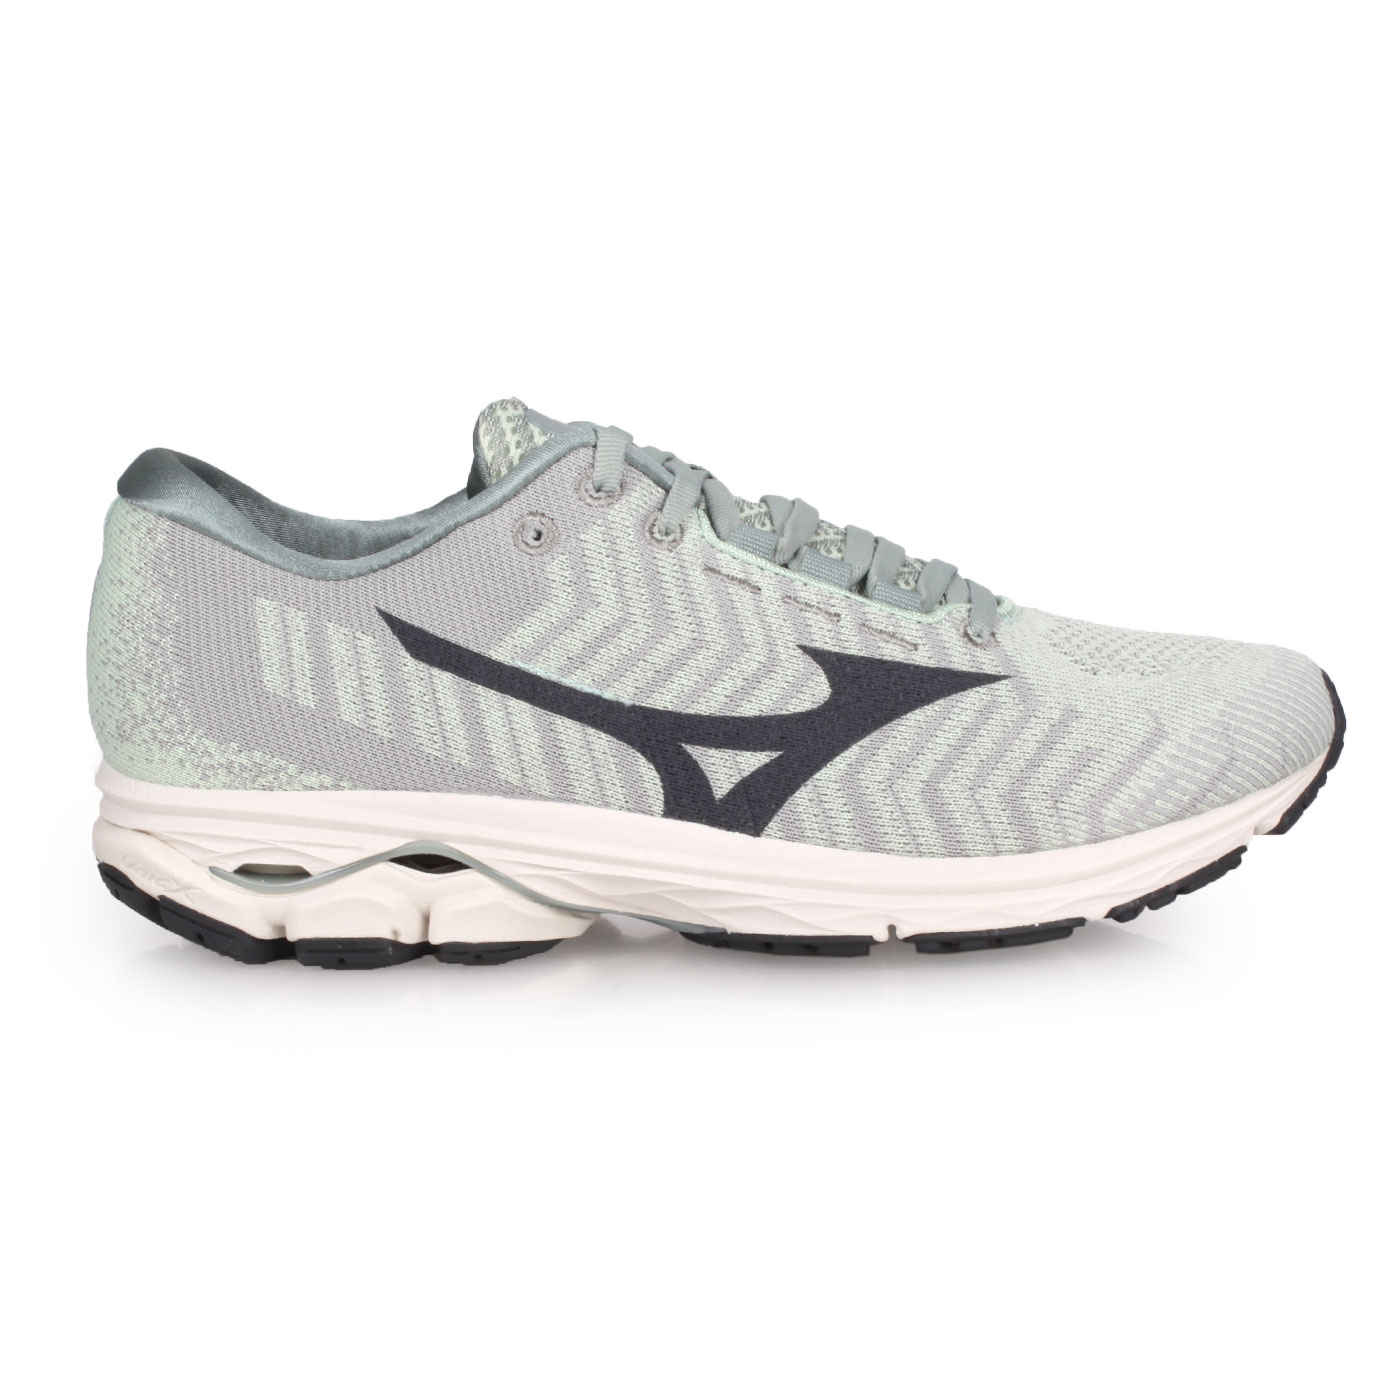 MIZUNO 男款慢跑鞋  @WAVE RIDER WAVEKNIT 3@J1GC192901 - 淺綠灰黑